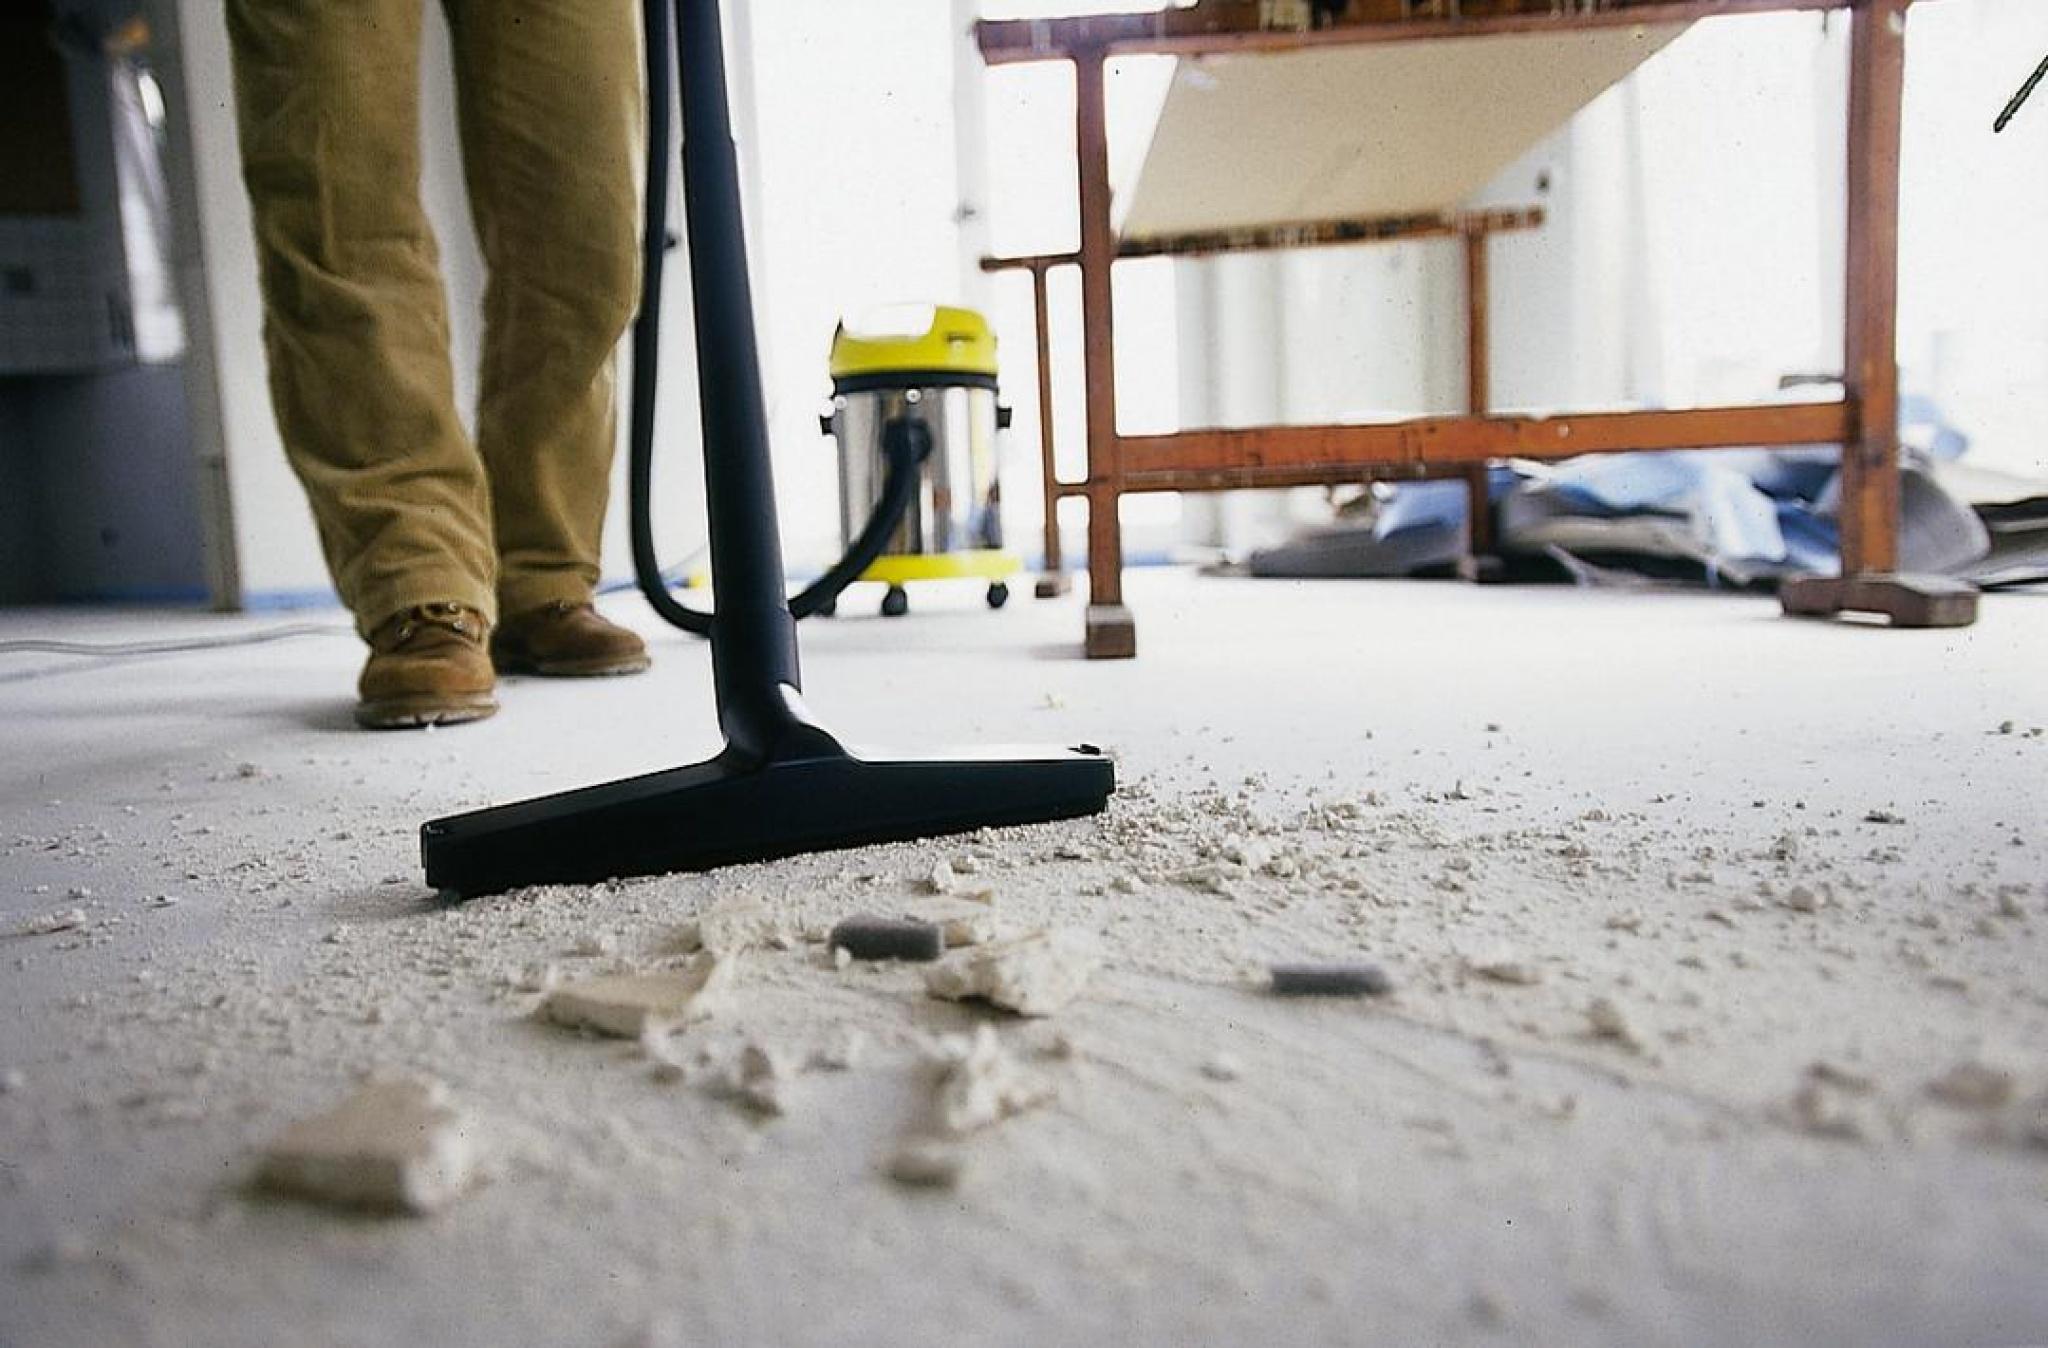 Уборка квартир после ремонта, убираем неприятные запахи